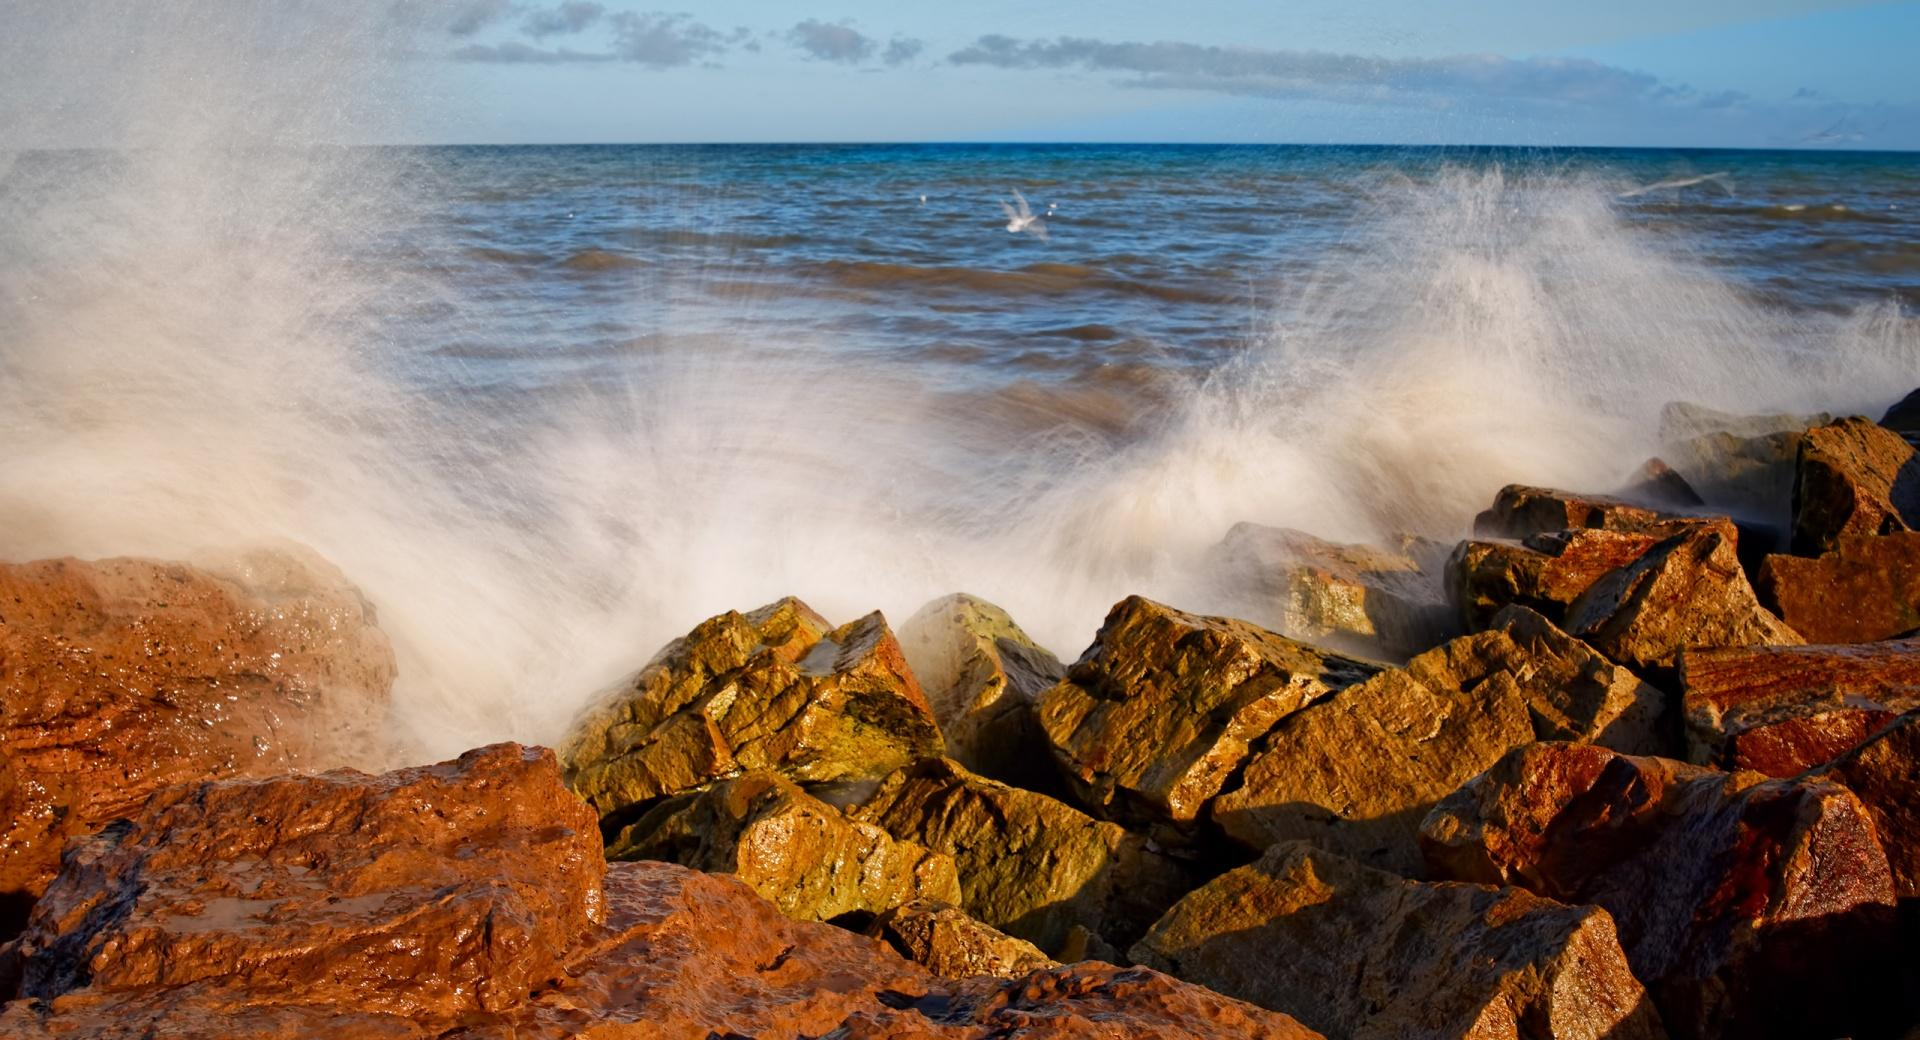 Splashing Wave Long Exposure wallpapers HD quality